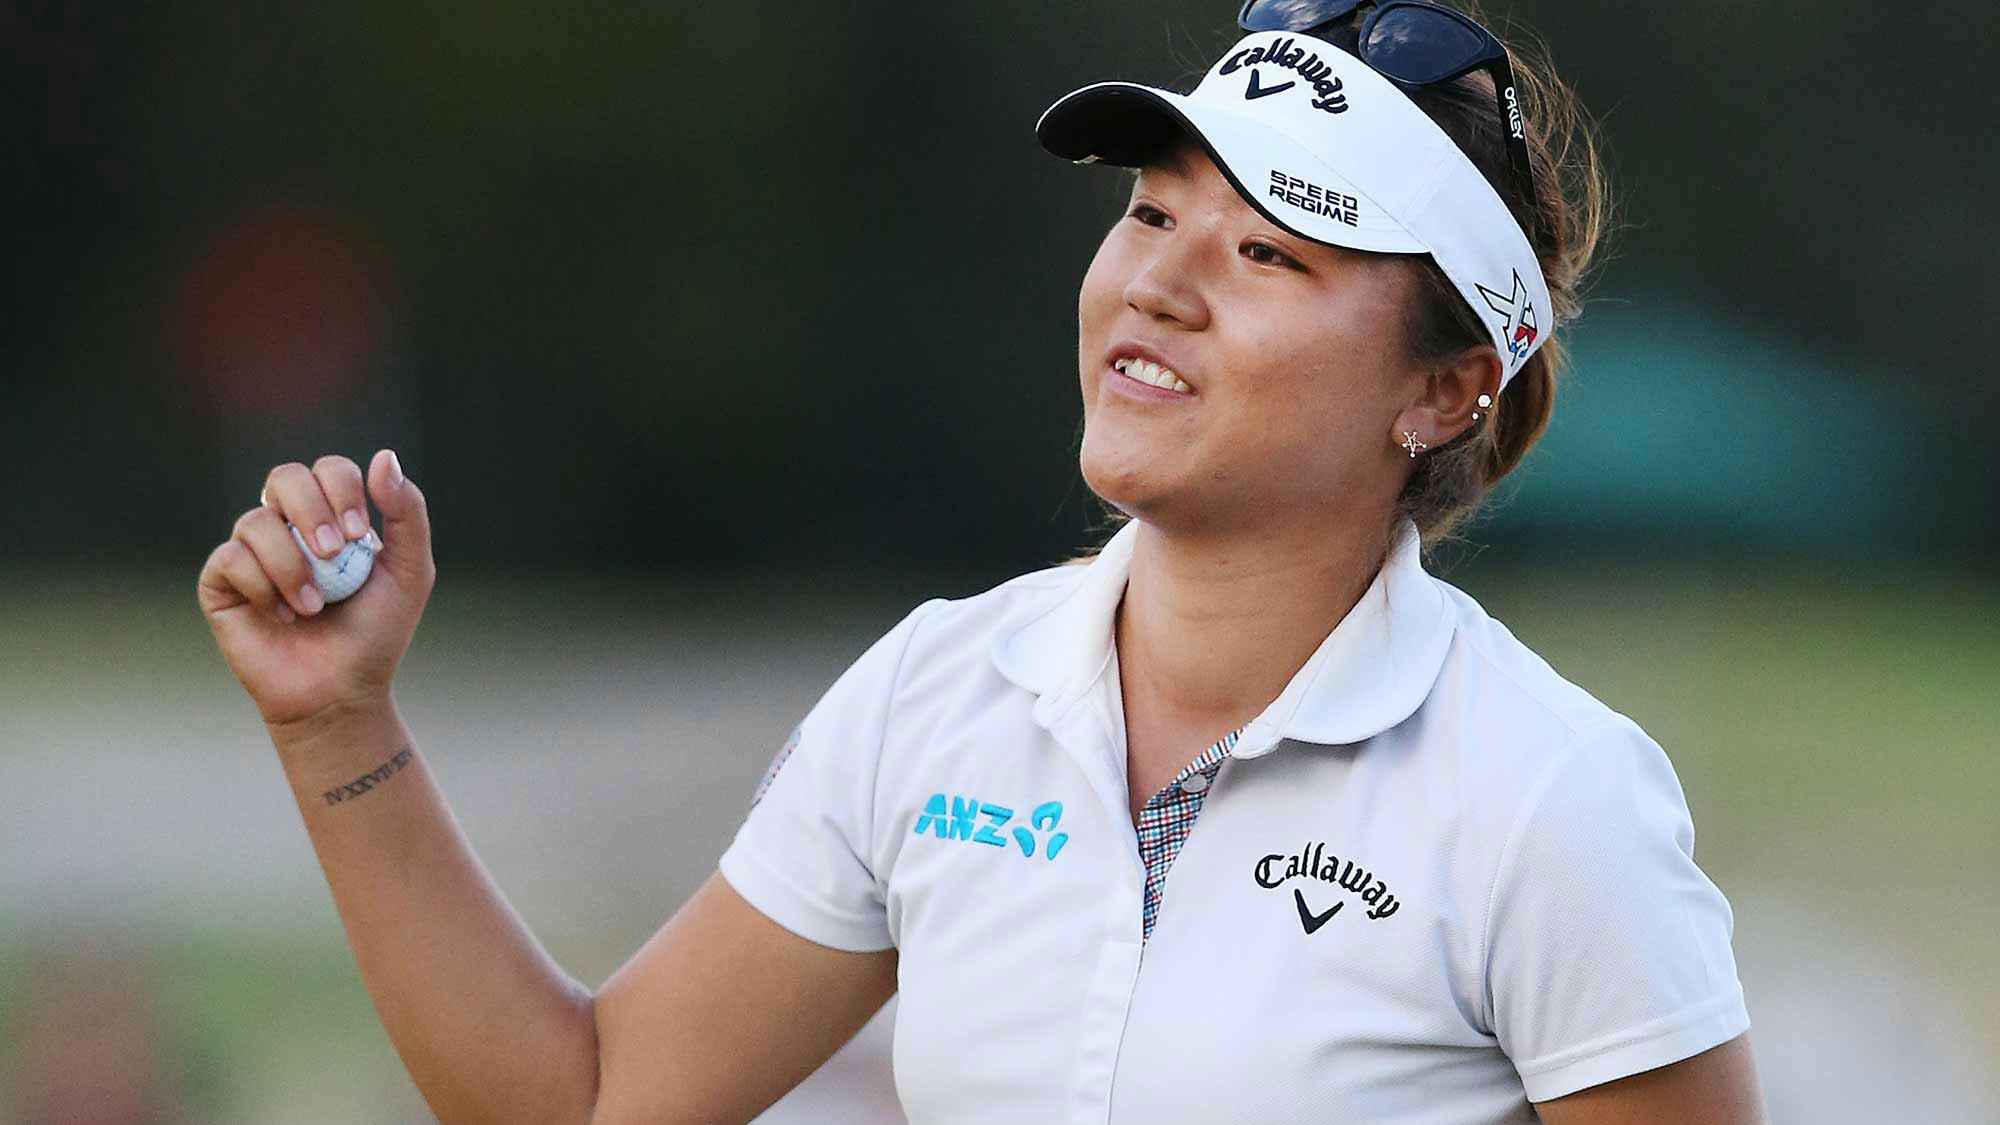 Love american womens canadian amateur golf girl